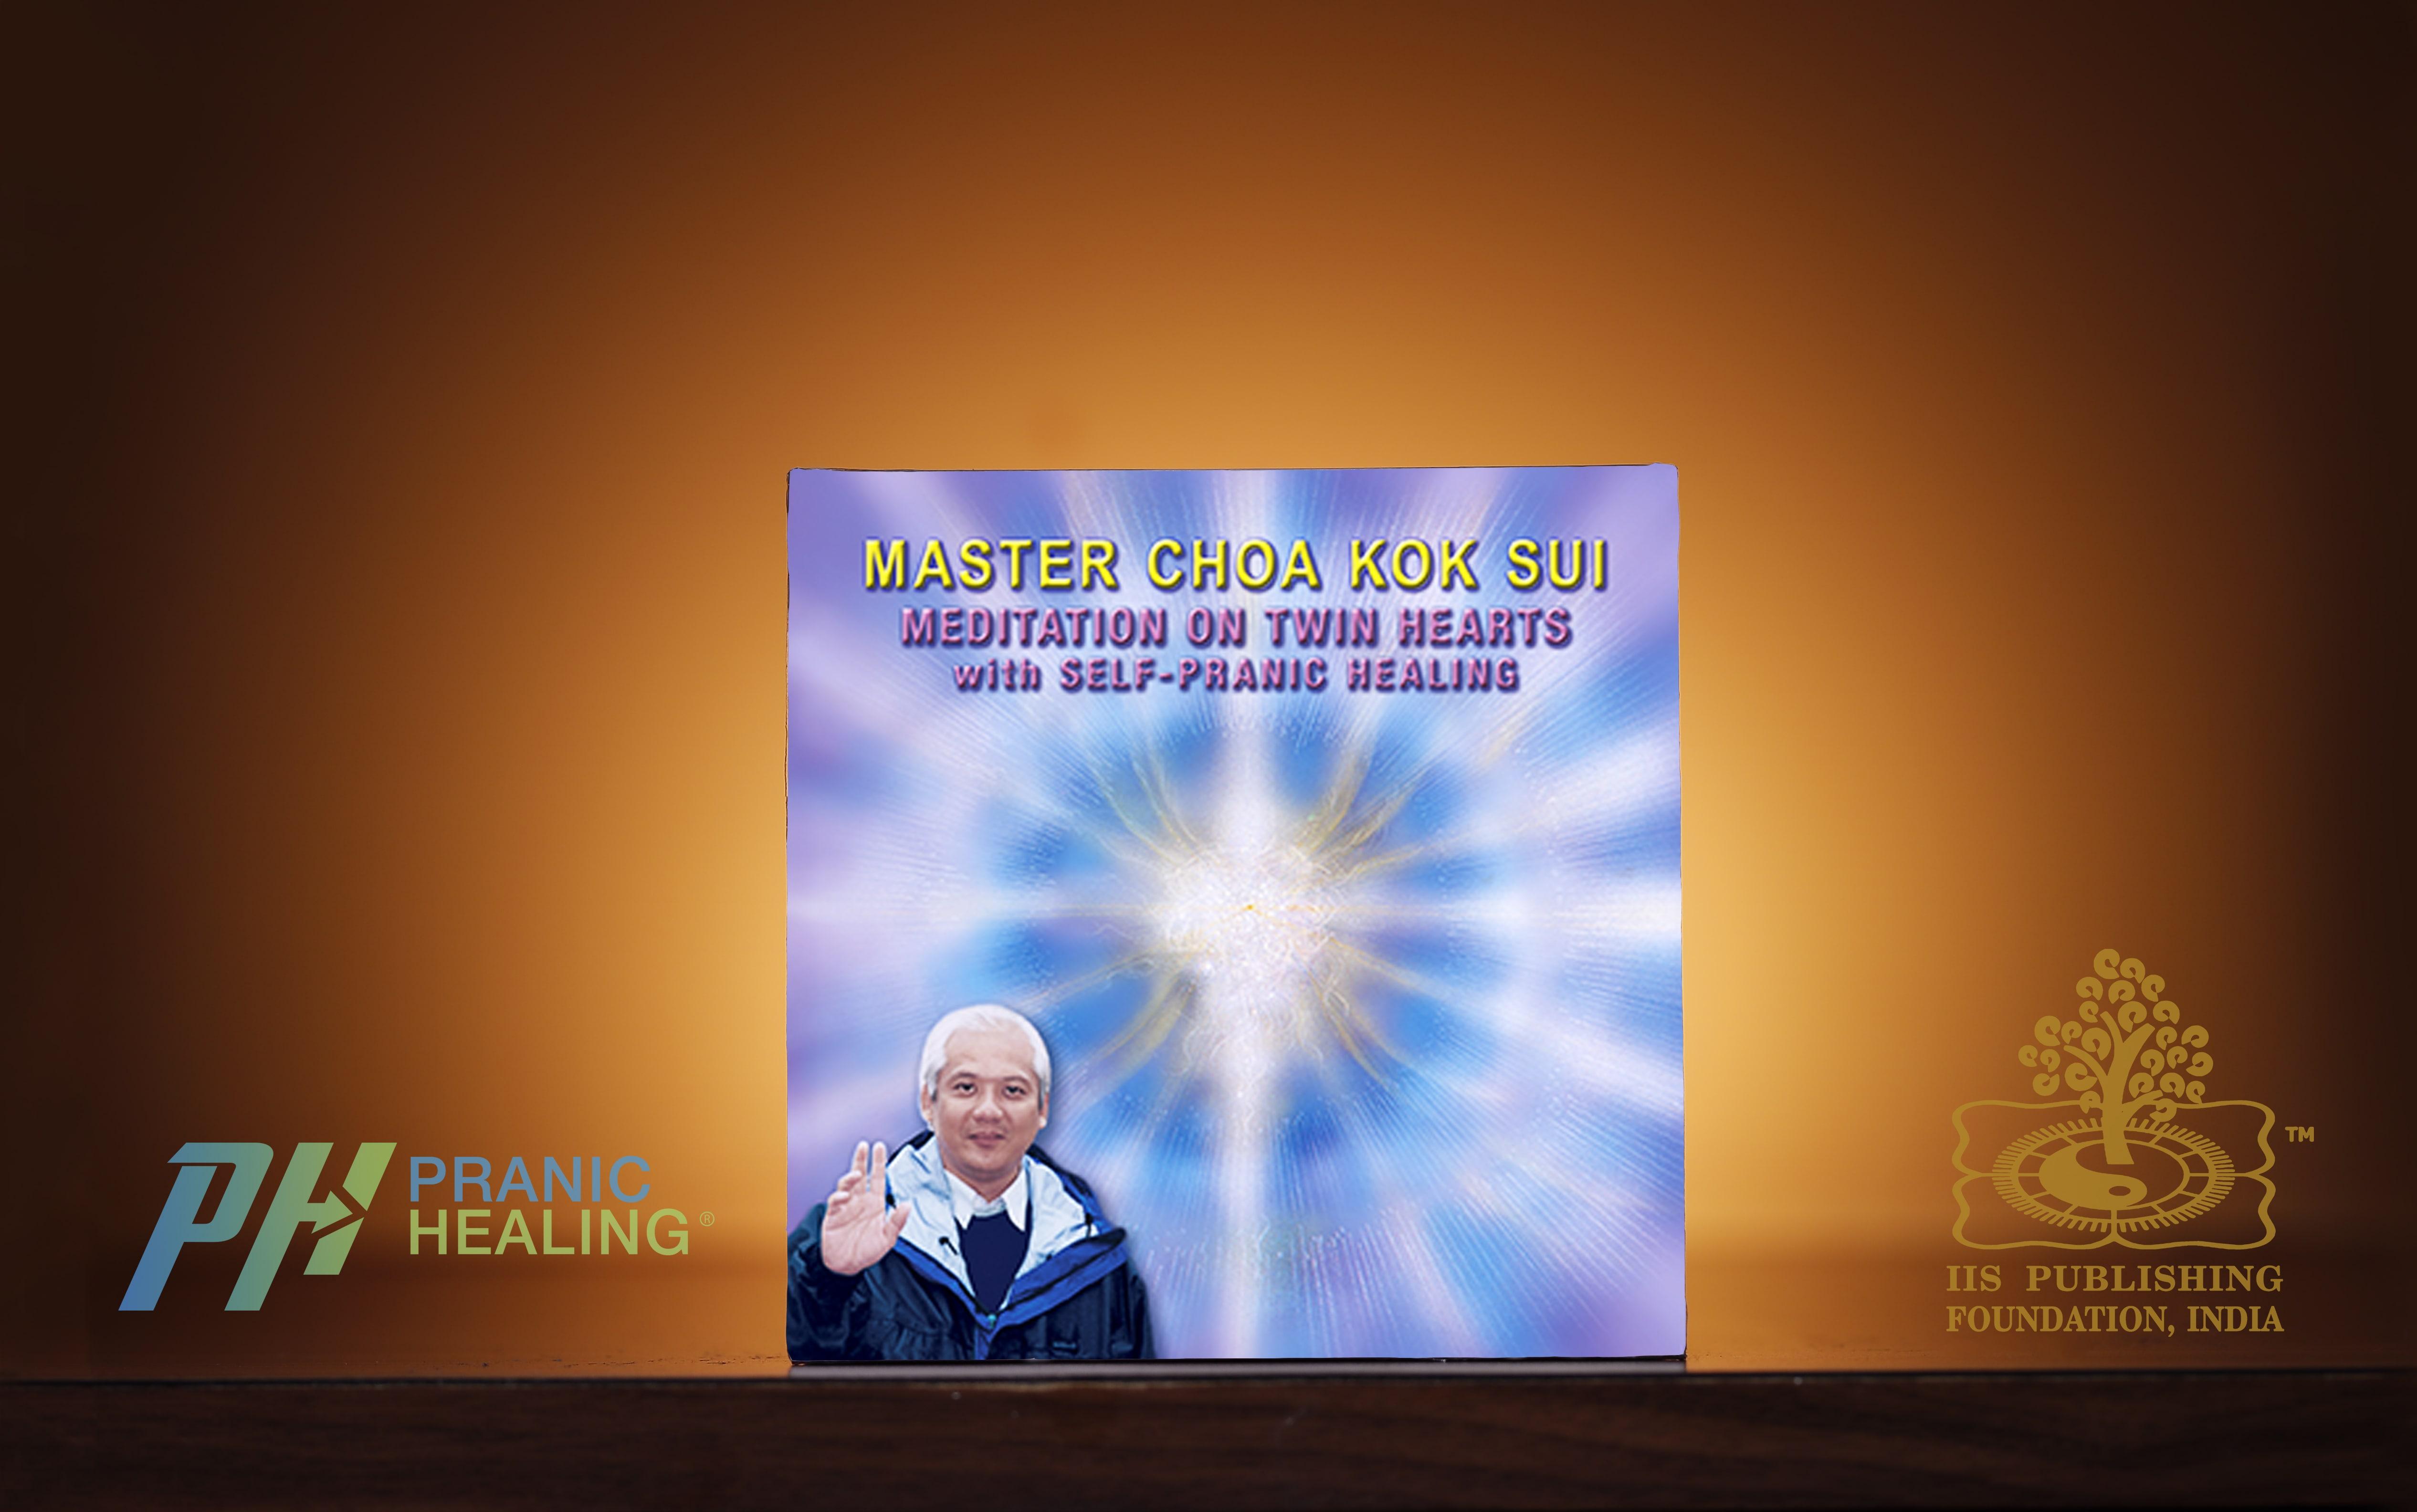 https://shop.pranichealingmumbai.com/products/meditation-on-twin-heart-with-self-healing-english